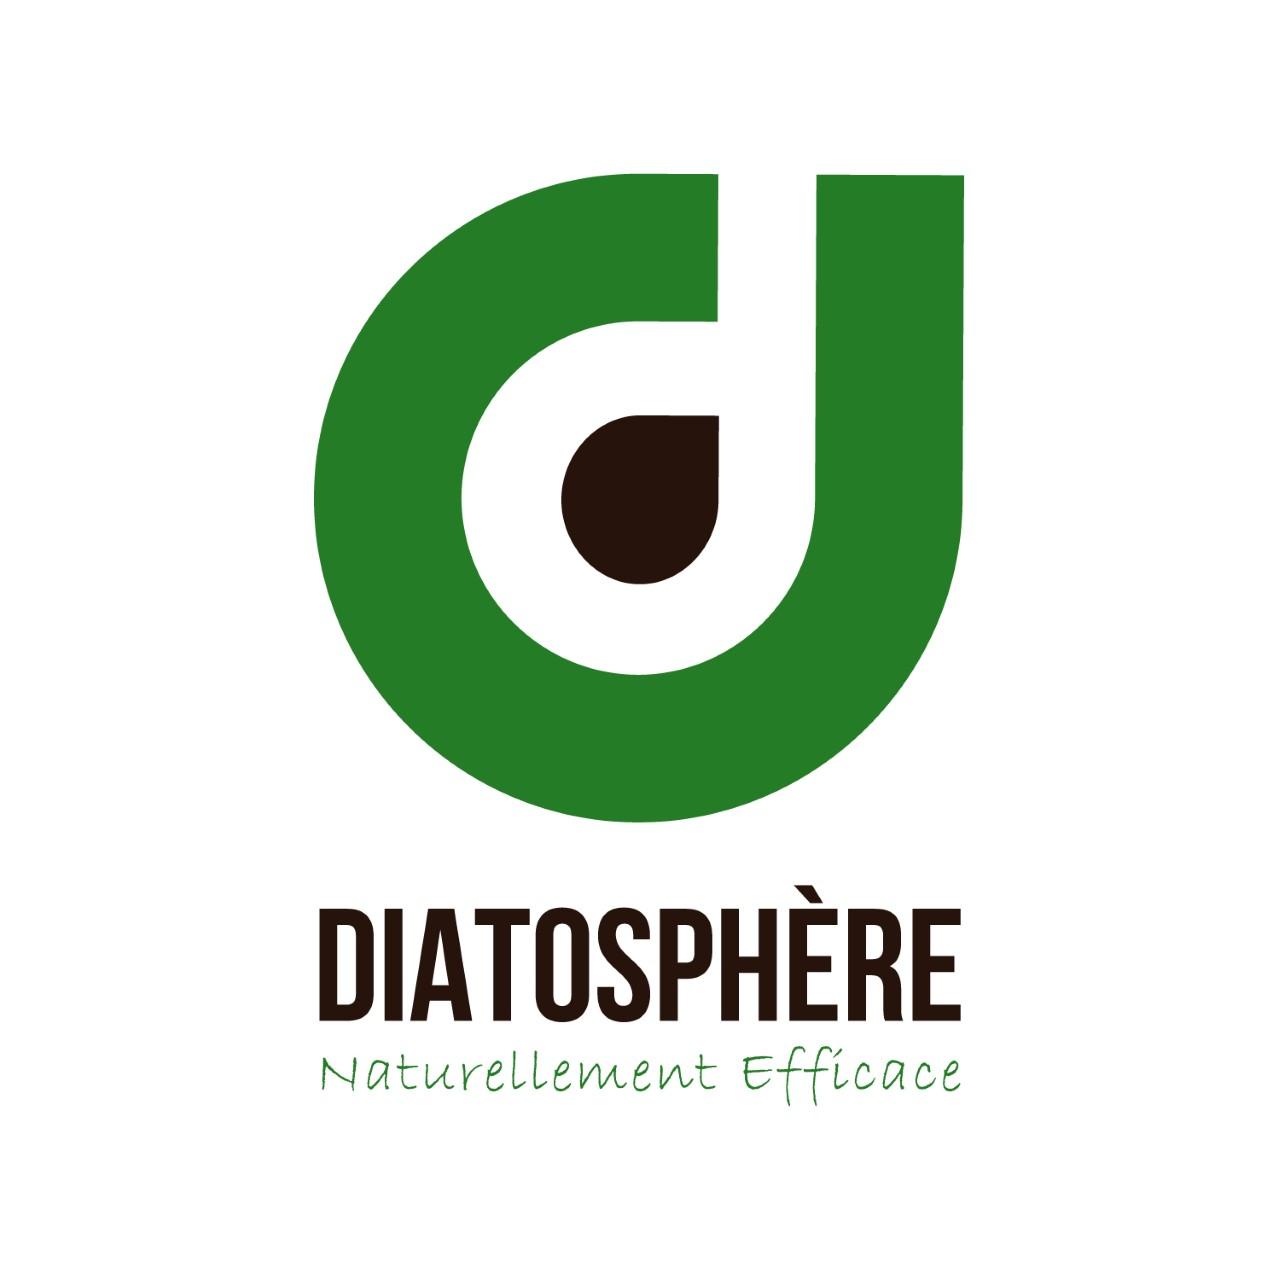 DIATOSPHERE